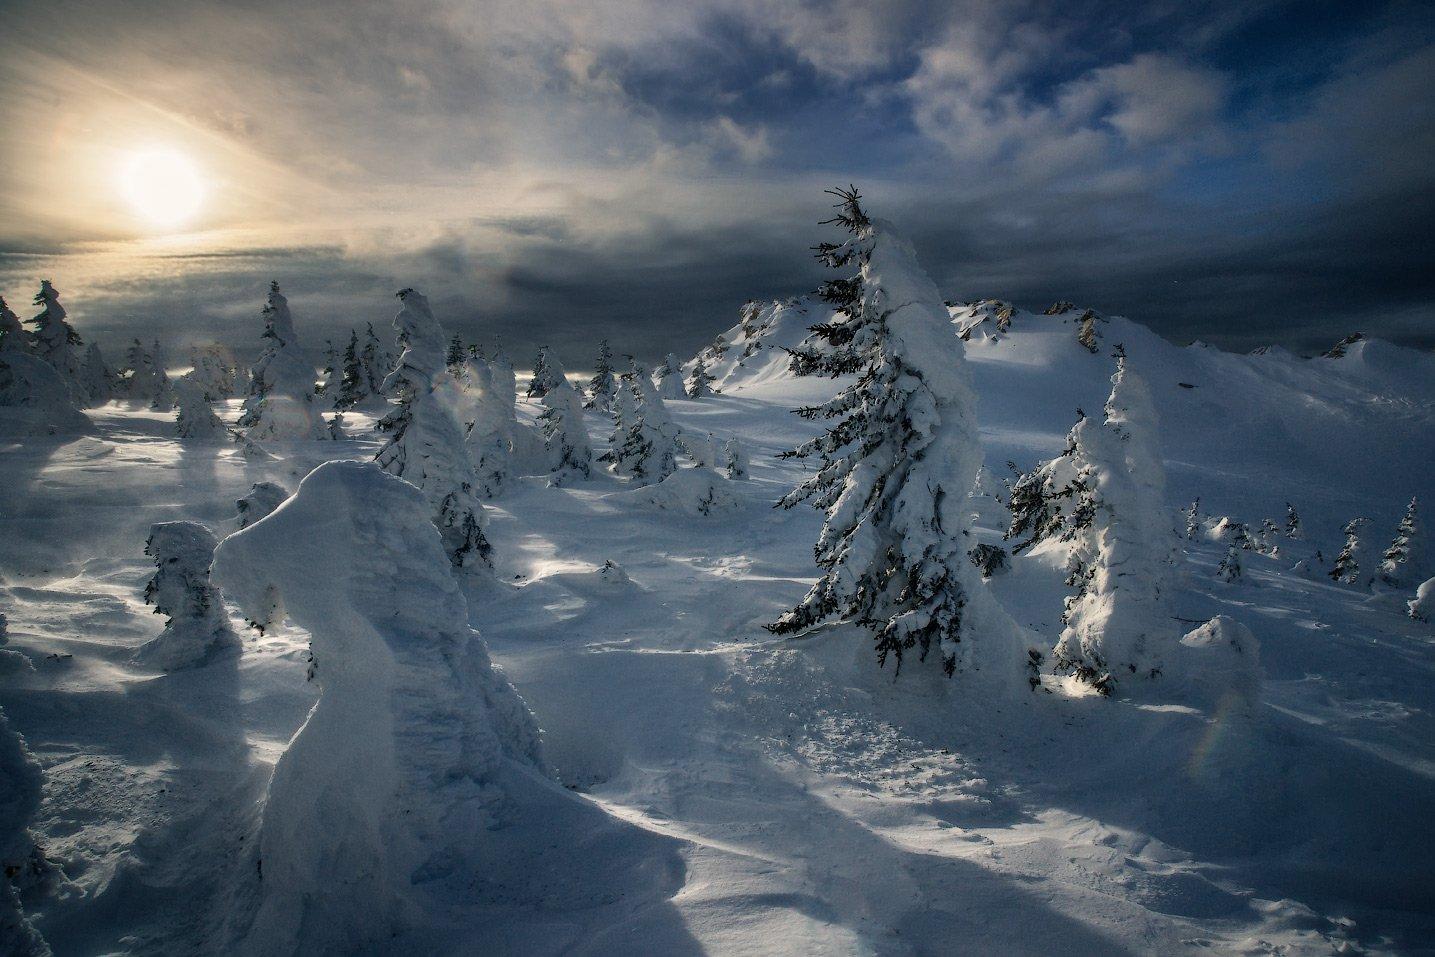 таганай, урал, горы, метео, зима, Владимир Ляпин